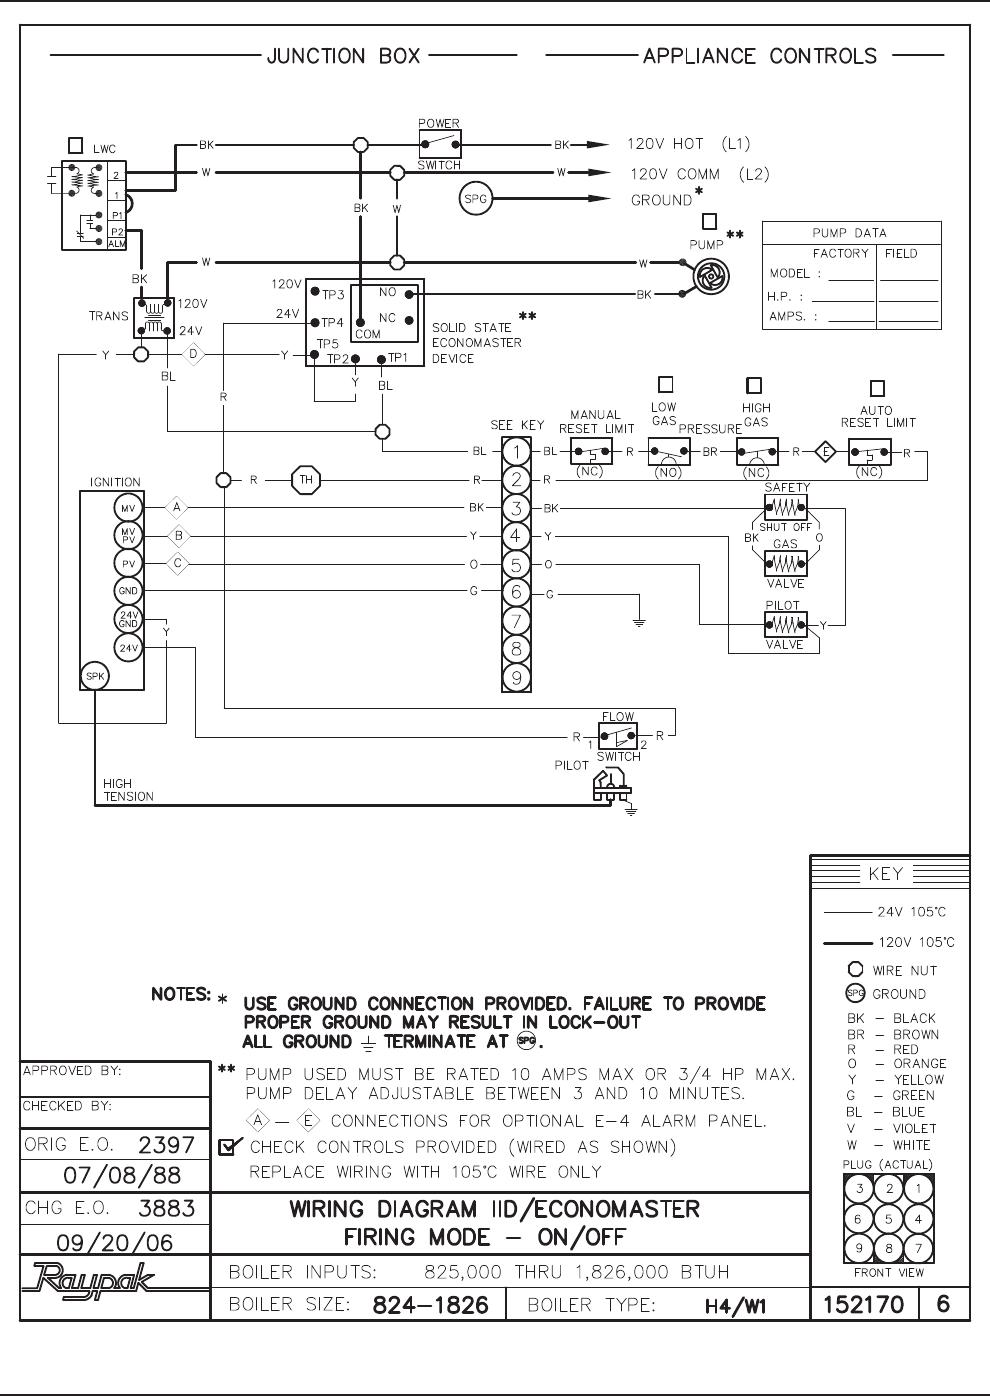 raypak boiler wiring diagram 6000 59 new rp2100 raytherm 1334001 raypak installation operating  raytherm 1334001 raypak installation